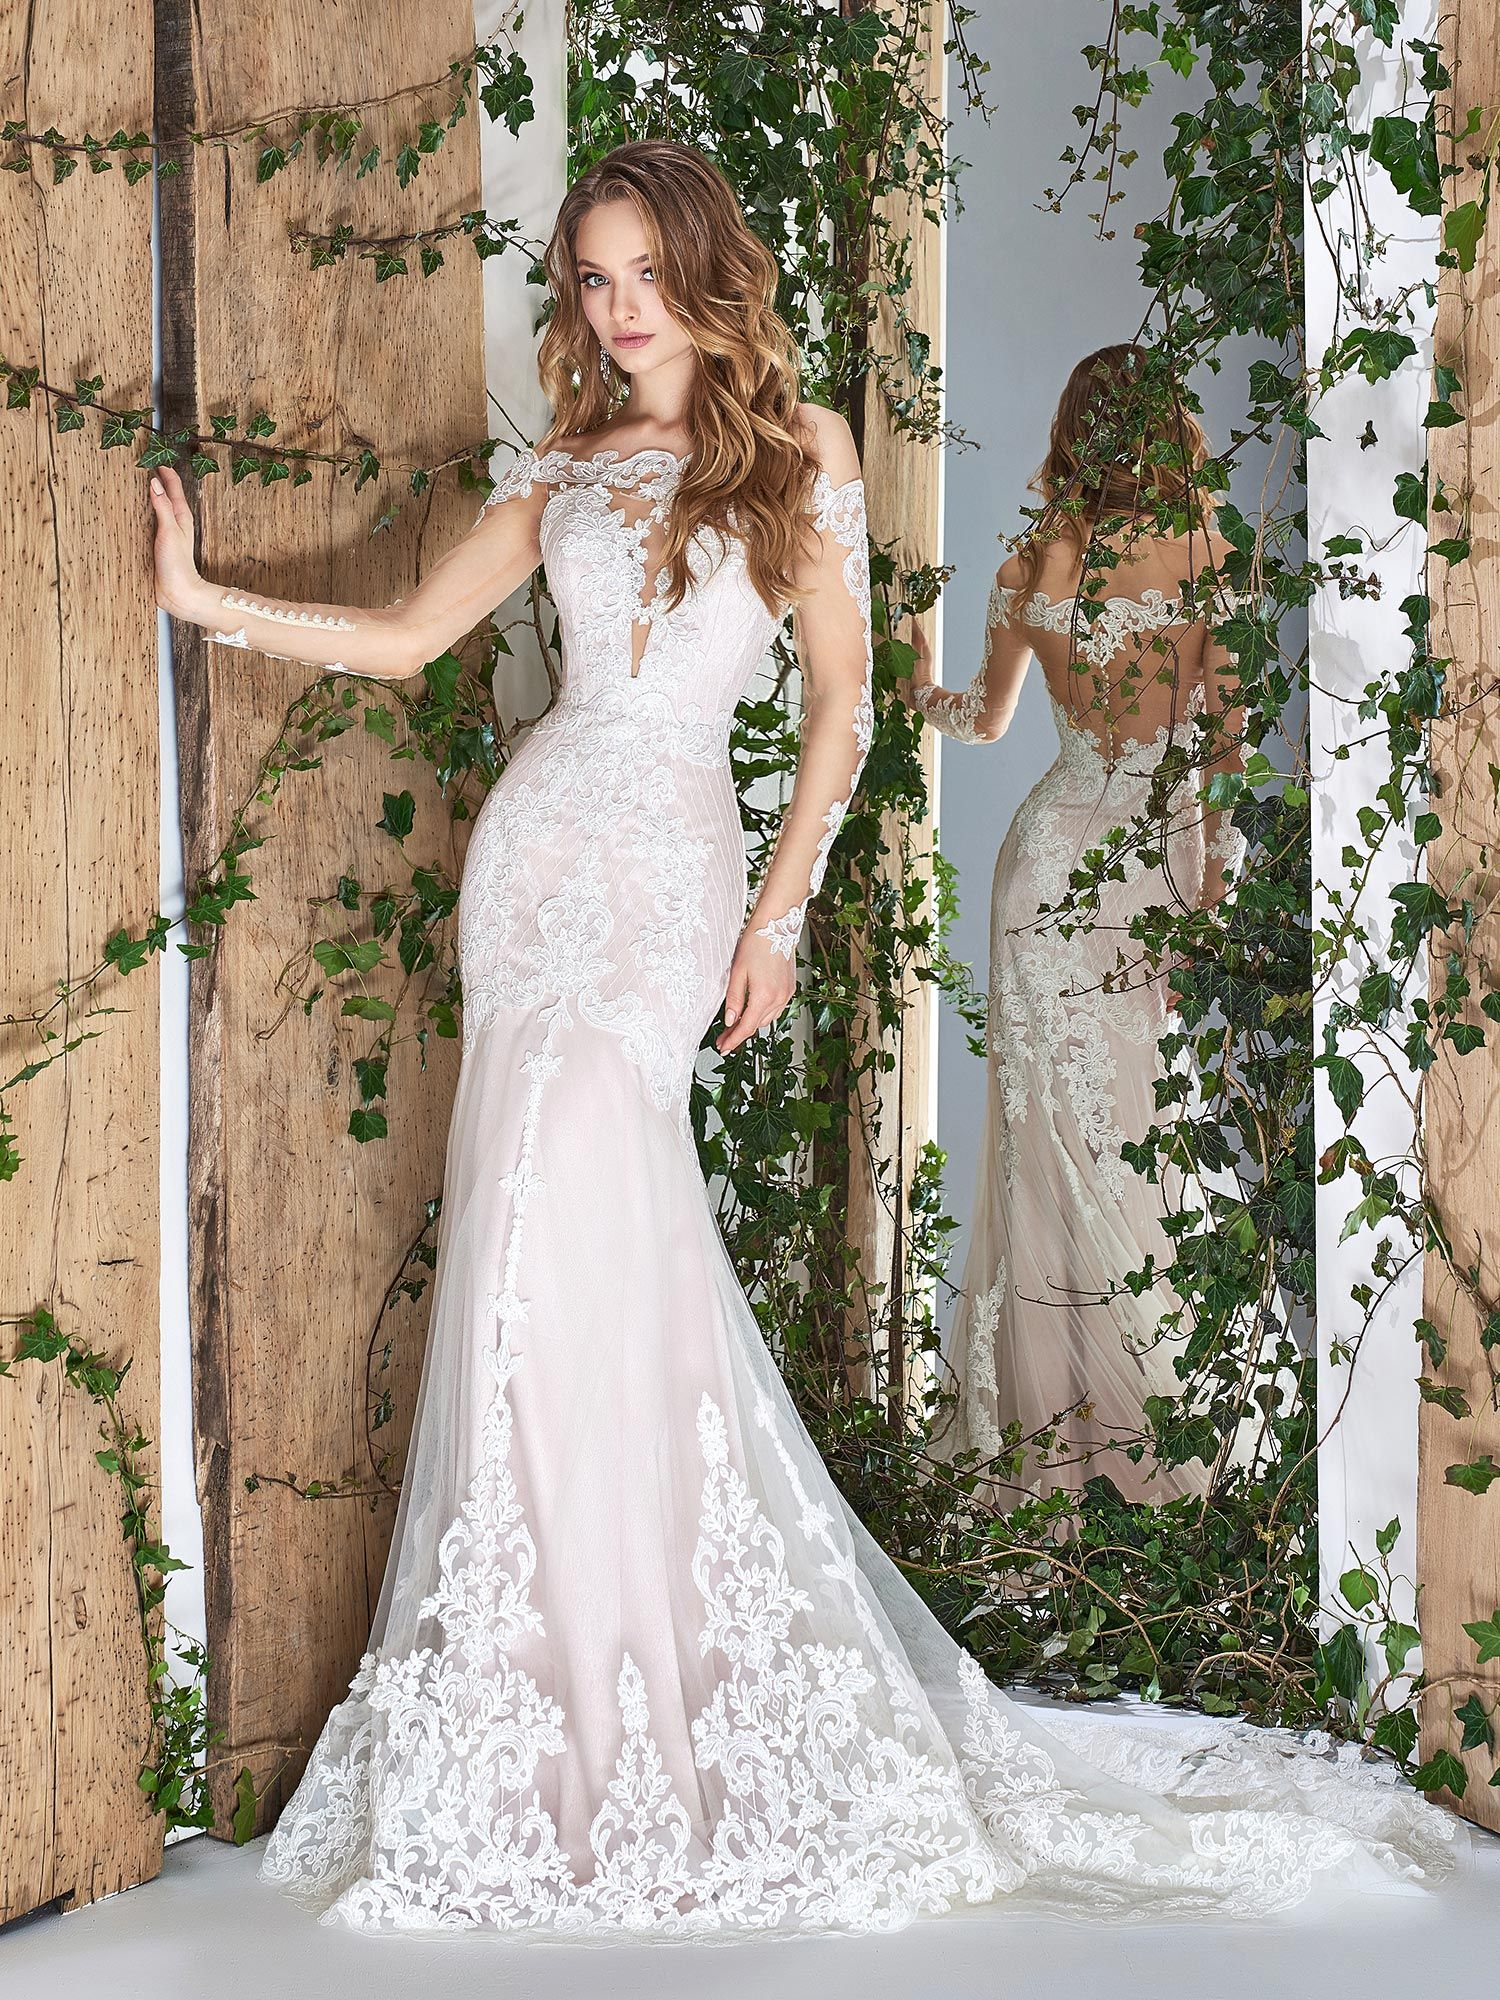 27++ Plunging neckline wedding dress with sleeves ideas